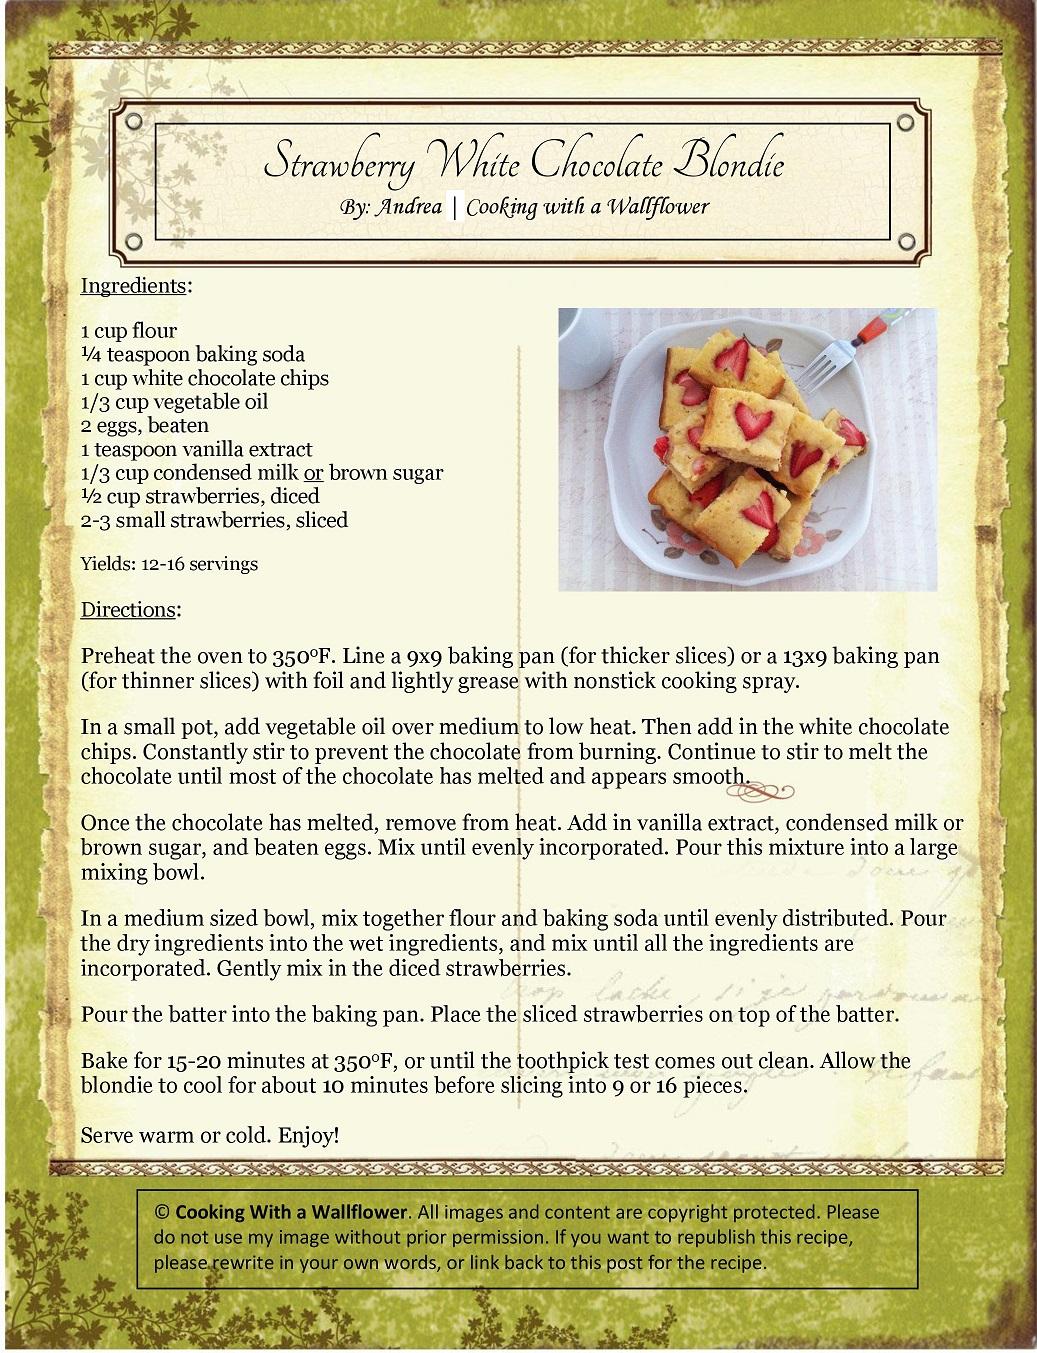 Strawberry White Chocolate Blondie Recipe Card